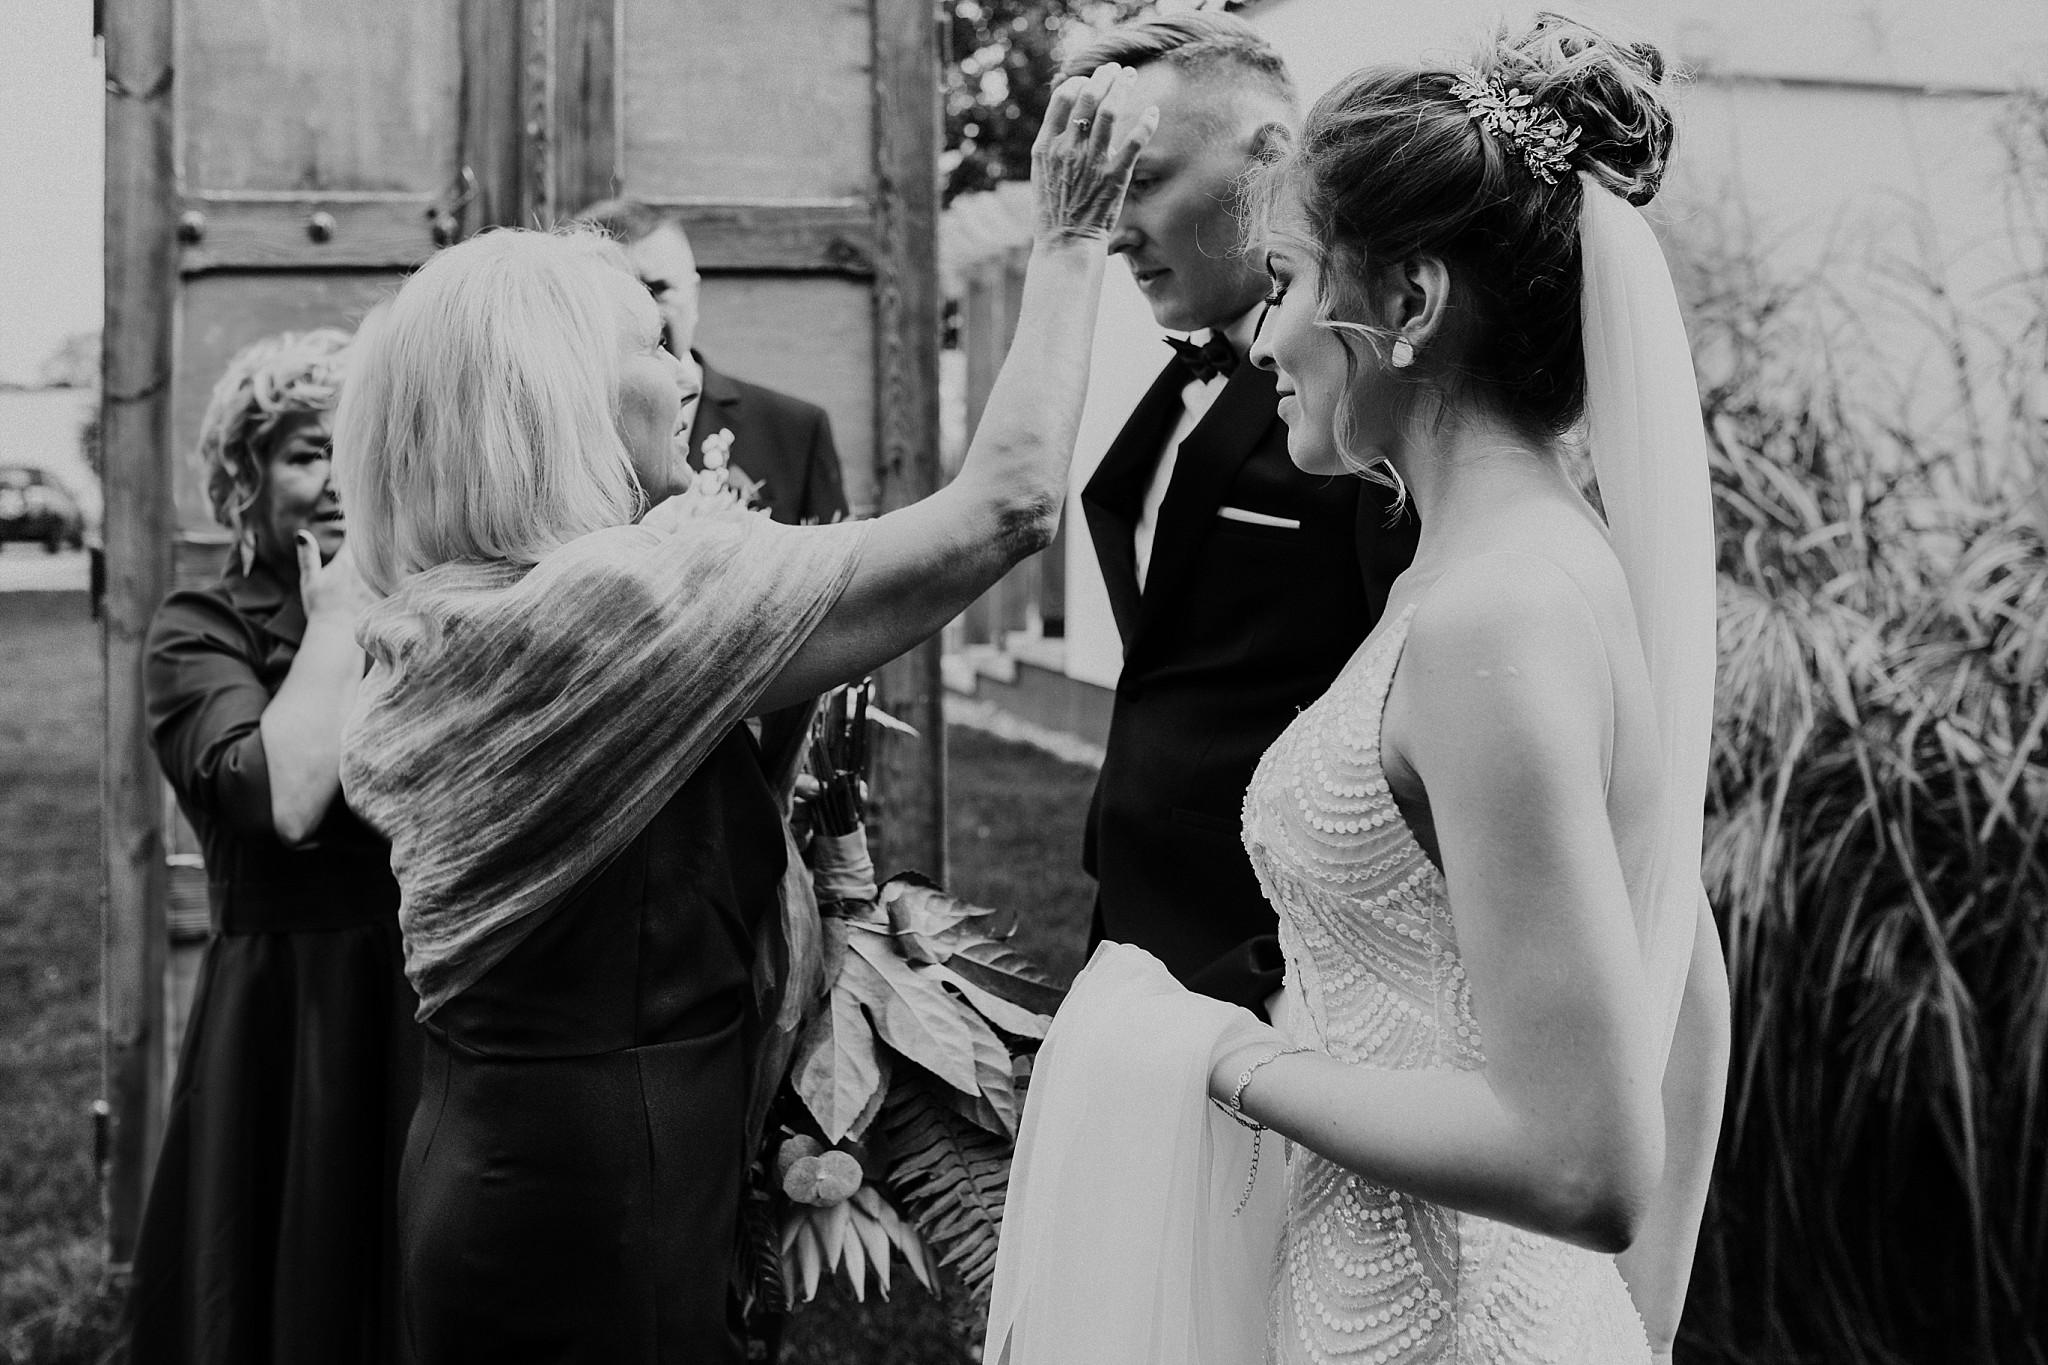 fotograf poznan wesele dobra truskawka piekne wesele pod poznaniem wesele w dobrej truskawce piekna para mloda slub marzen slub koronawirus slub listopad wesele koronawirus 104